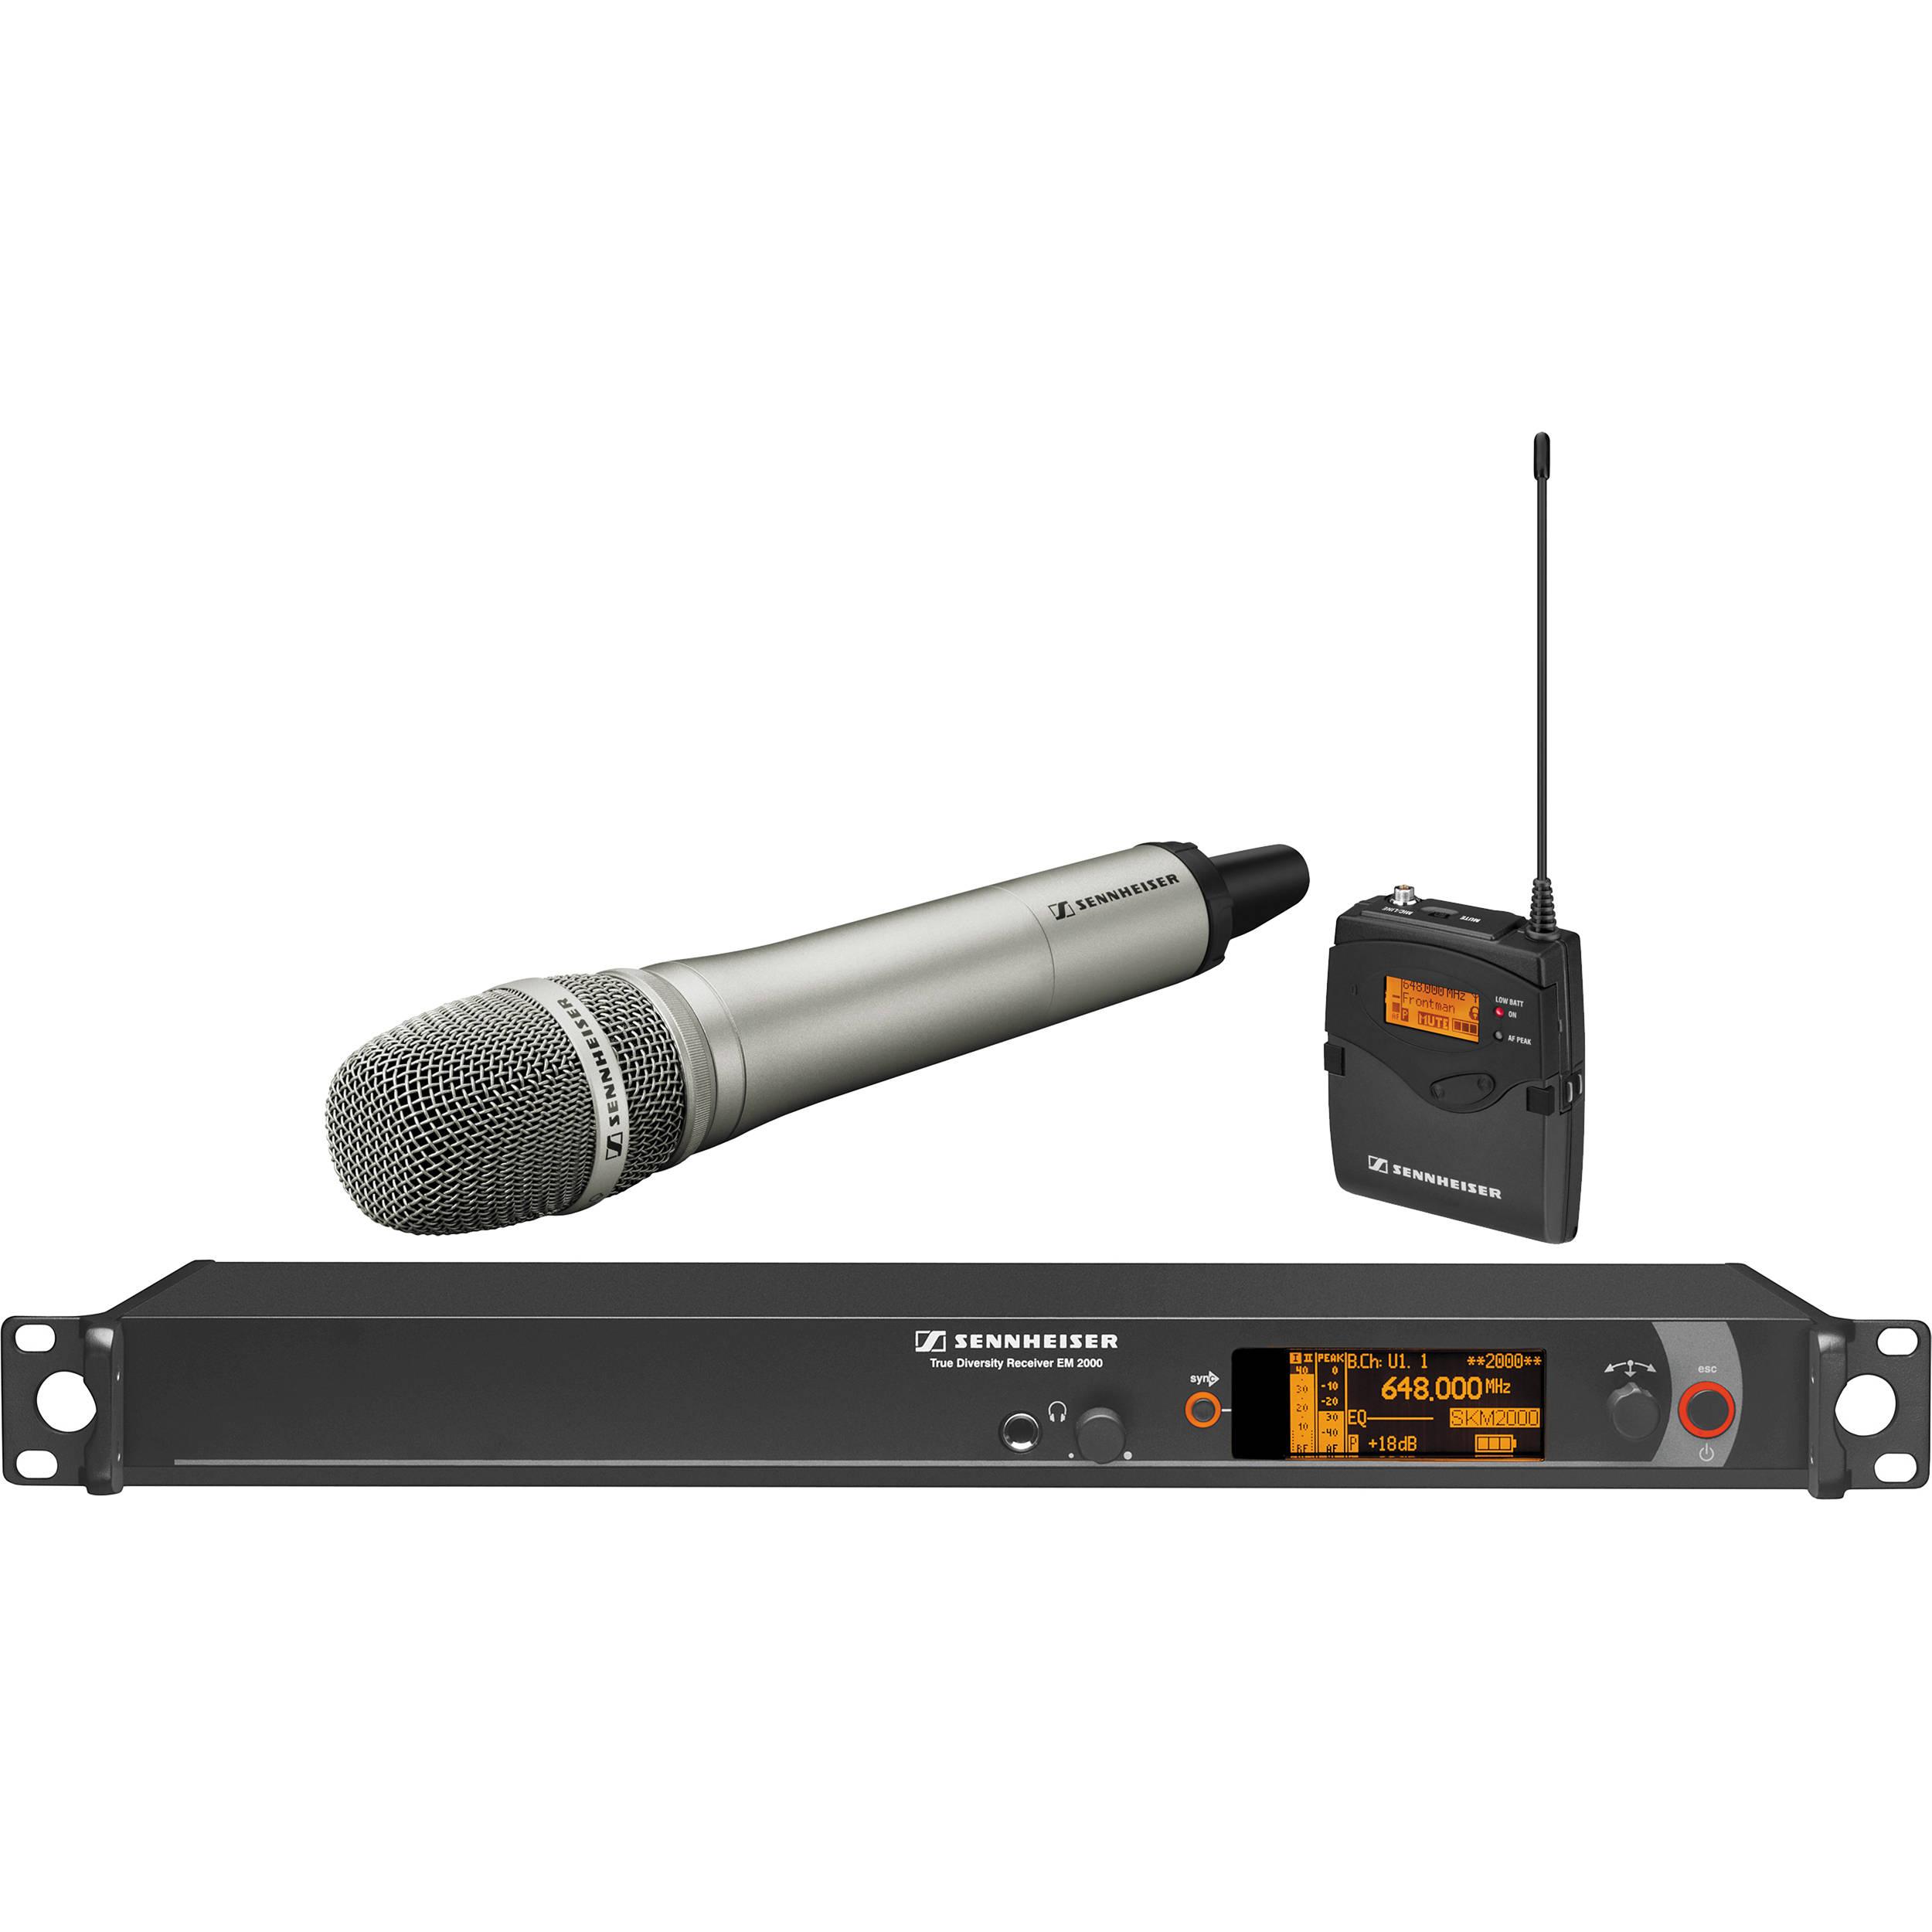 sennheiser 2000 series wireless microphone system 2000c1 204ni b rh bhphotovideo com sennheiser ew100 g2 wireless microphone manual Sennheiser Wireless Microphone Accessories